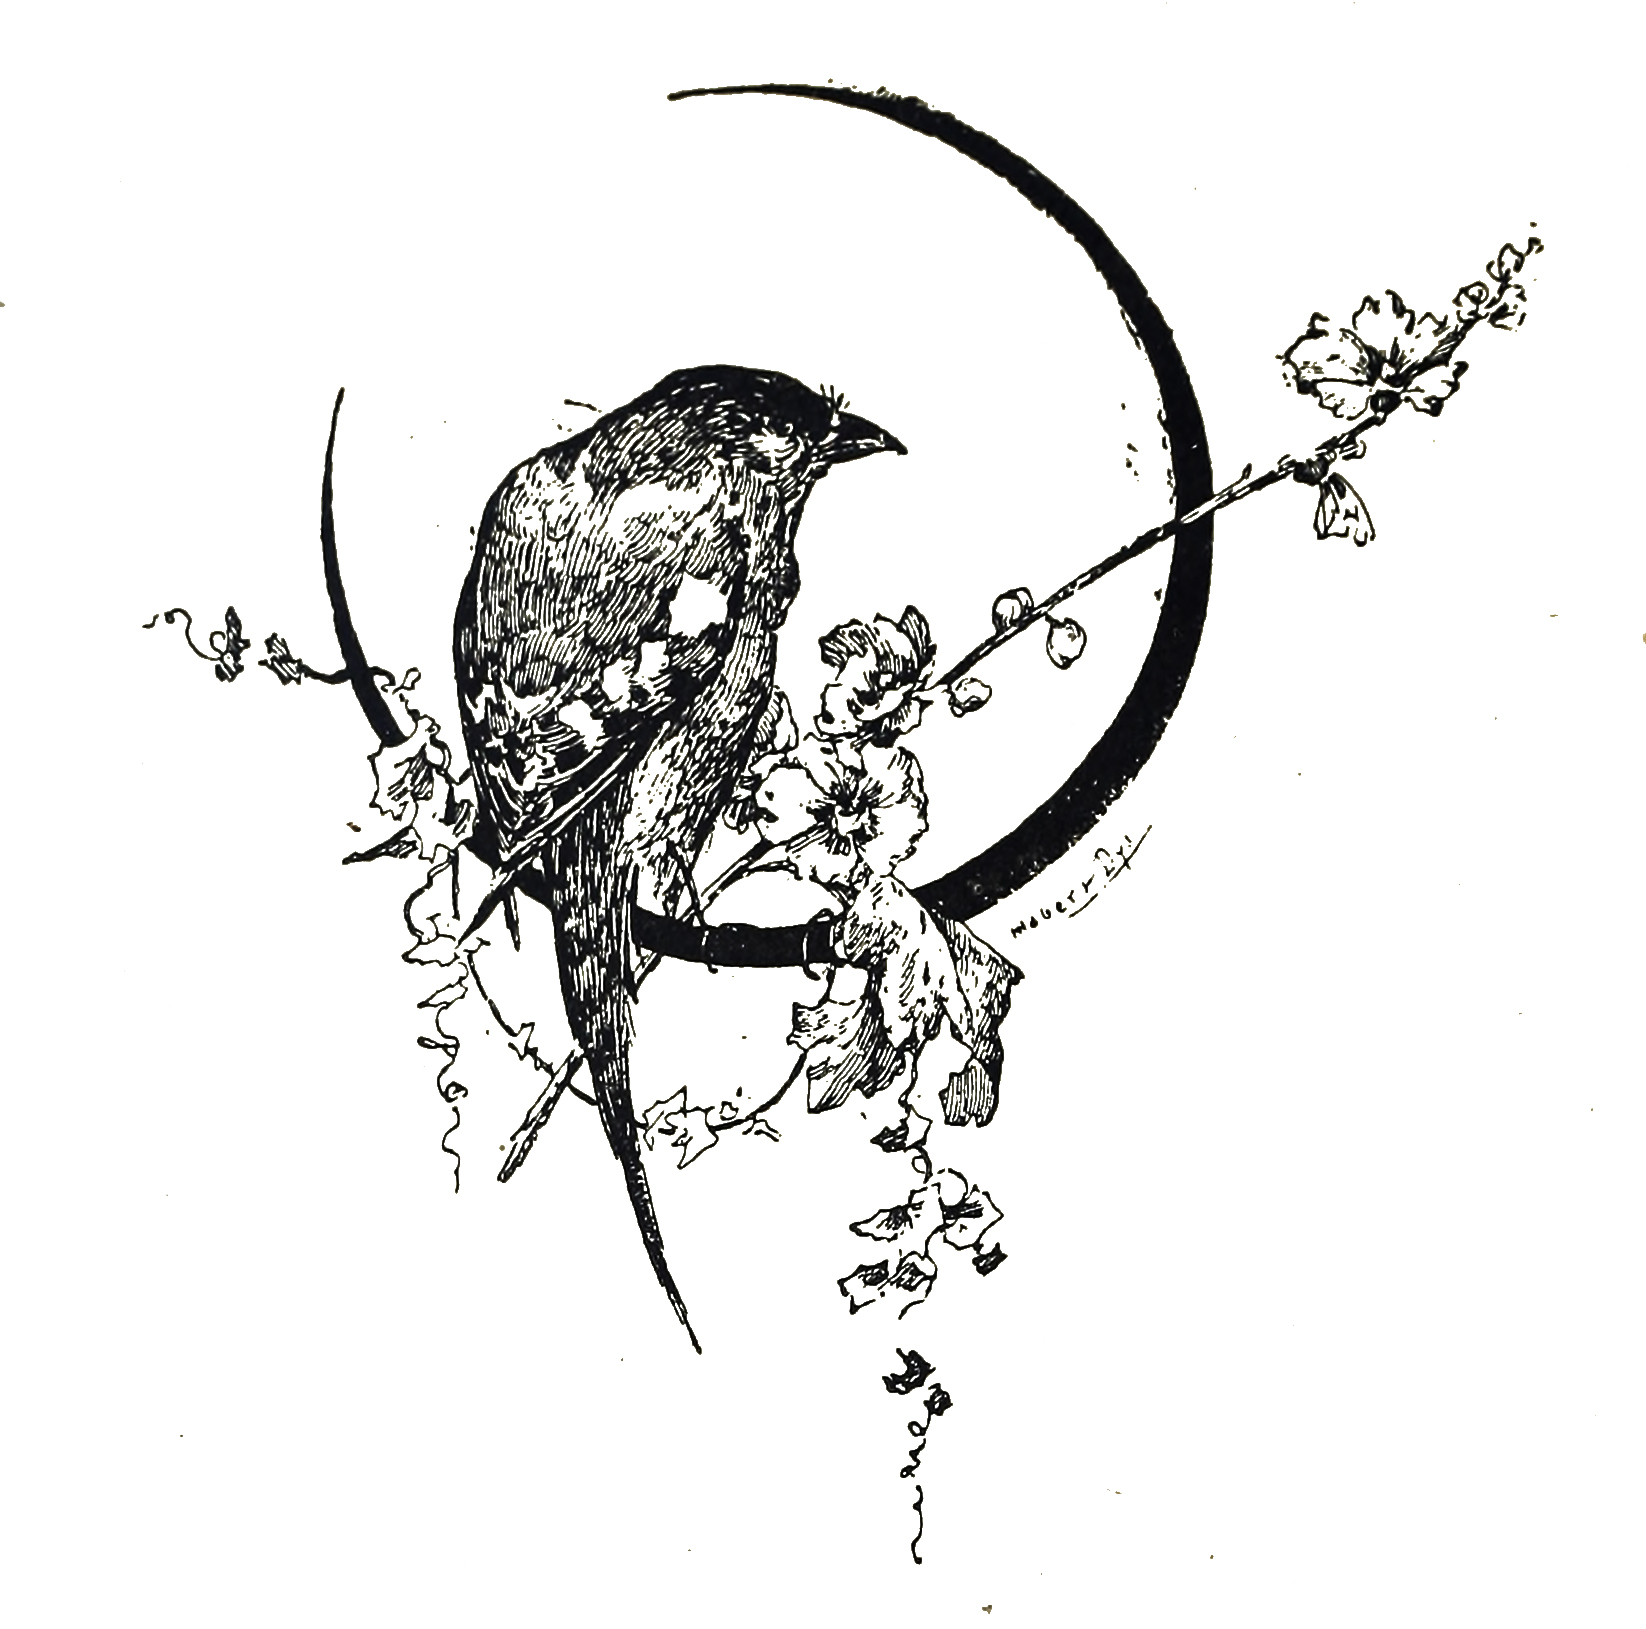 Vintage Love Birds Illustration